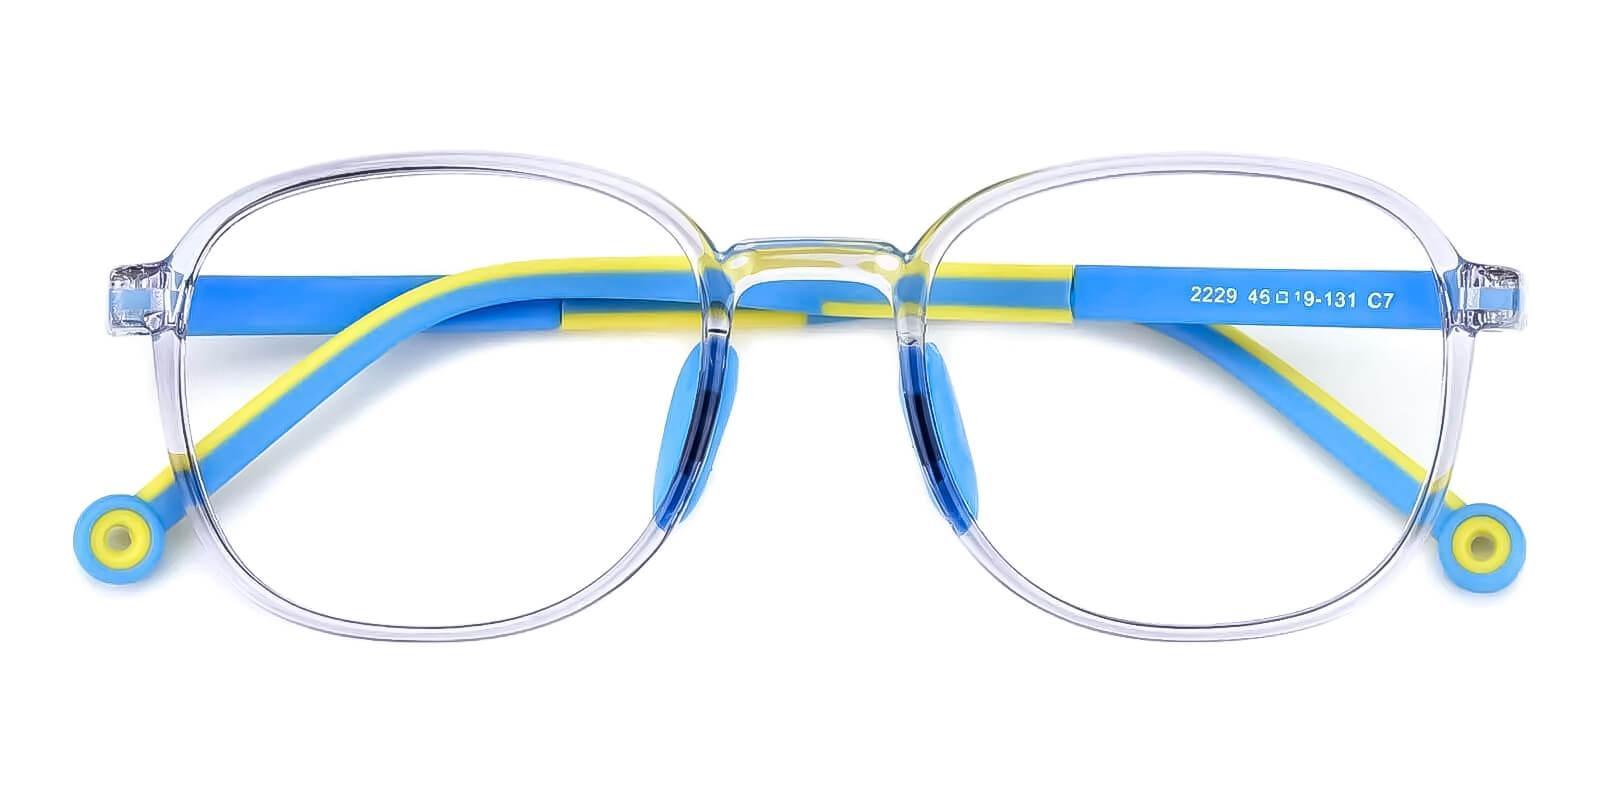 Kids-Astute Translucent TR Eyeglasses , Fashion , UniversalBridgeFit Frames from ABBE Glasses